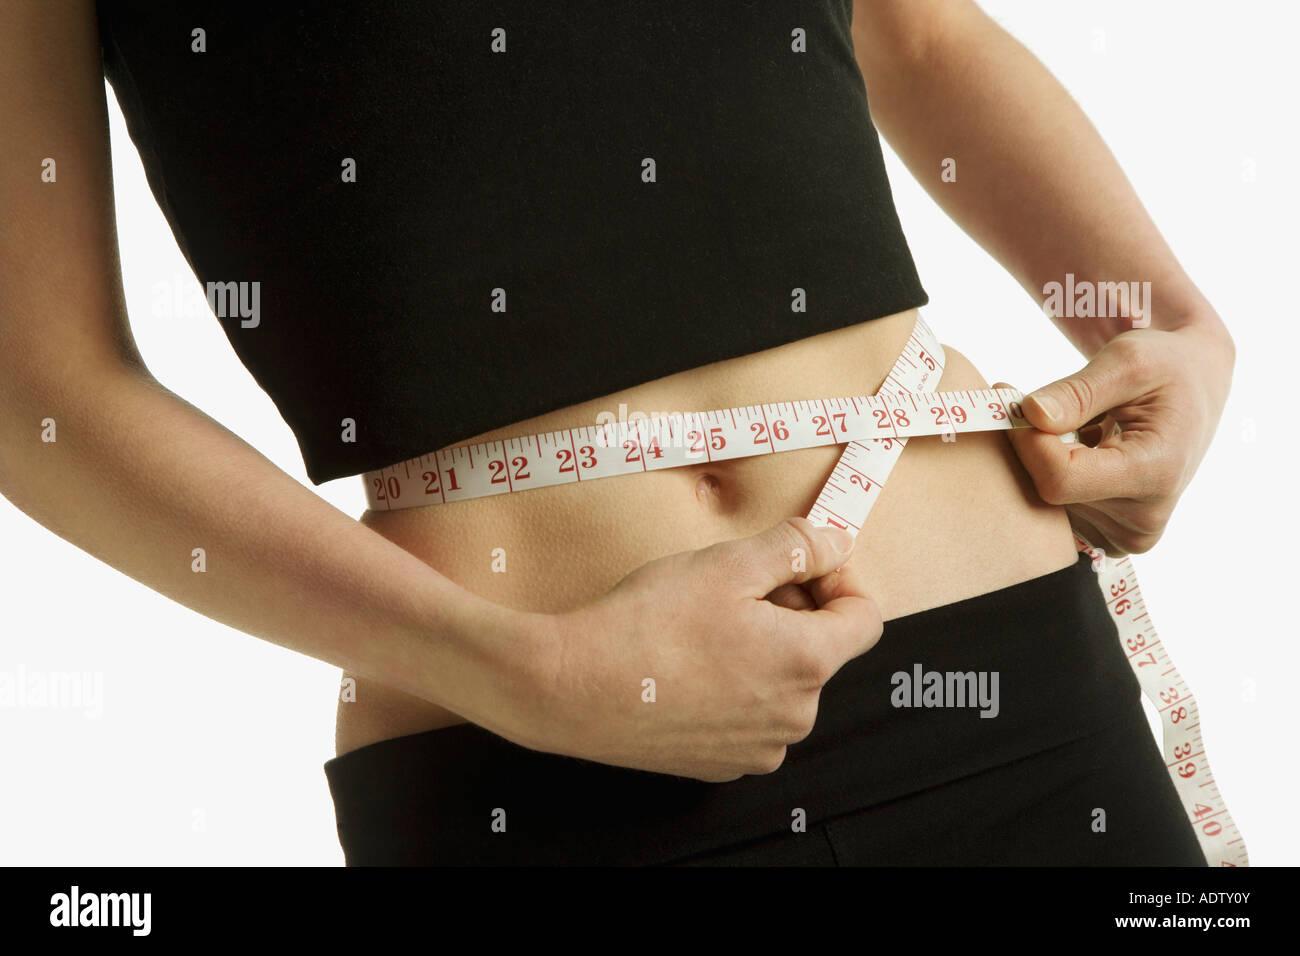 Measuring a waist-line - Stock Image